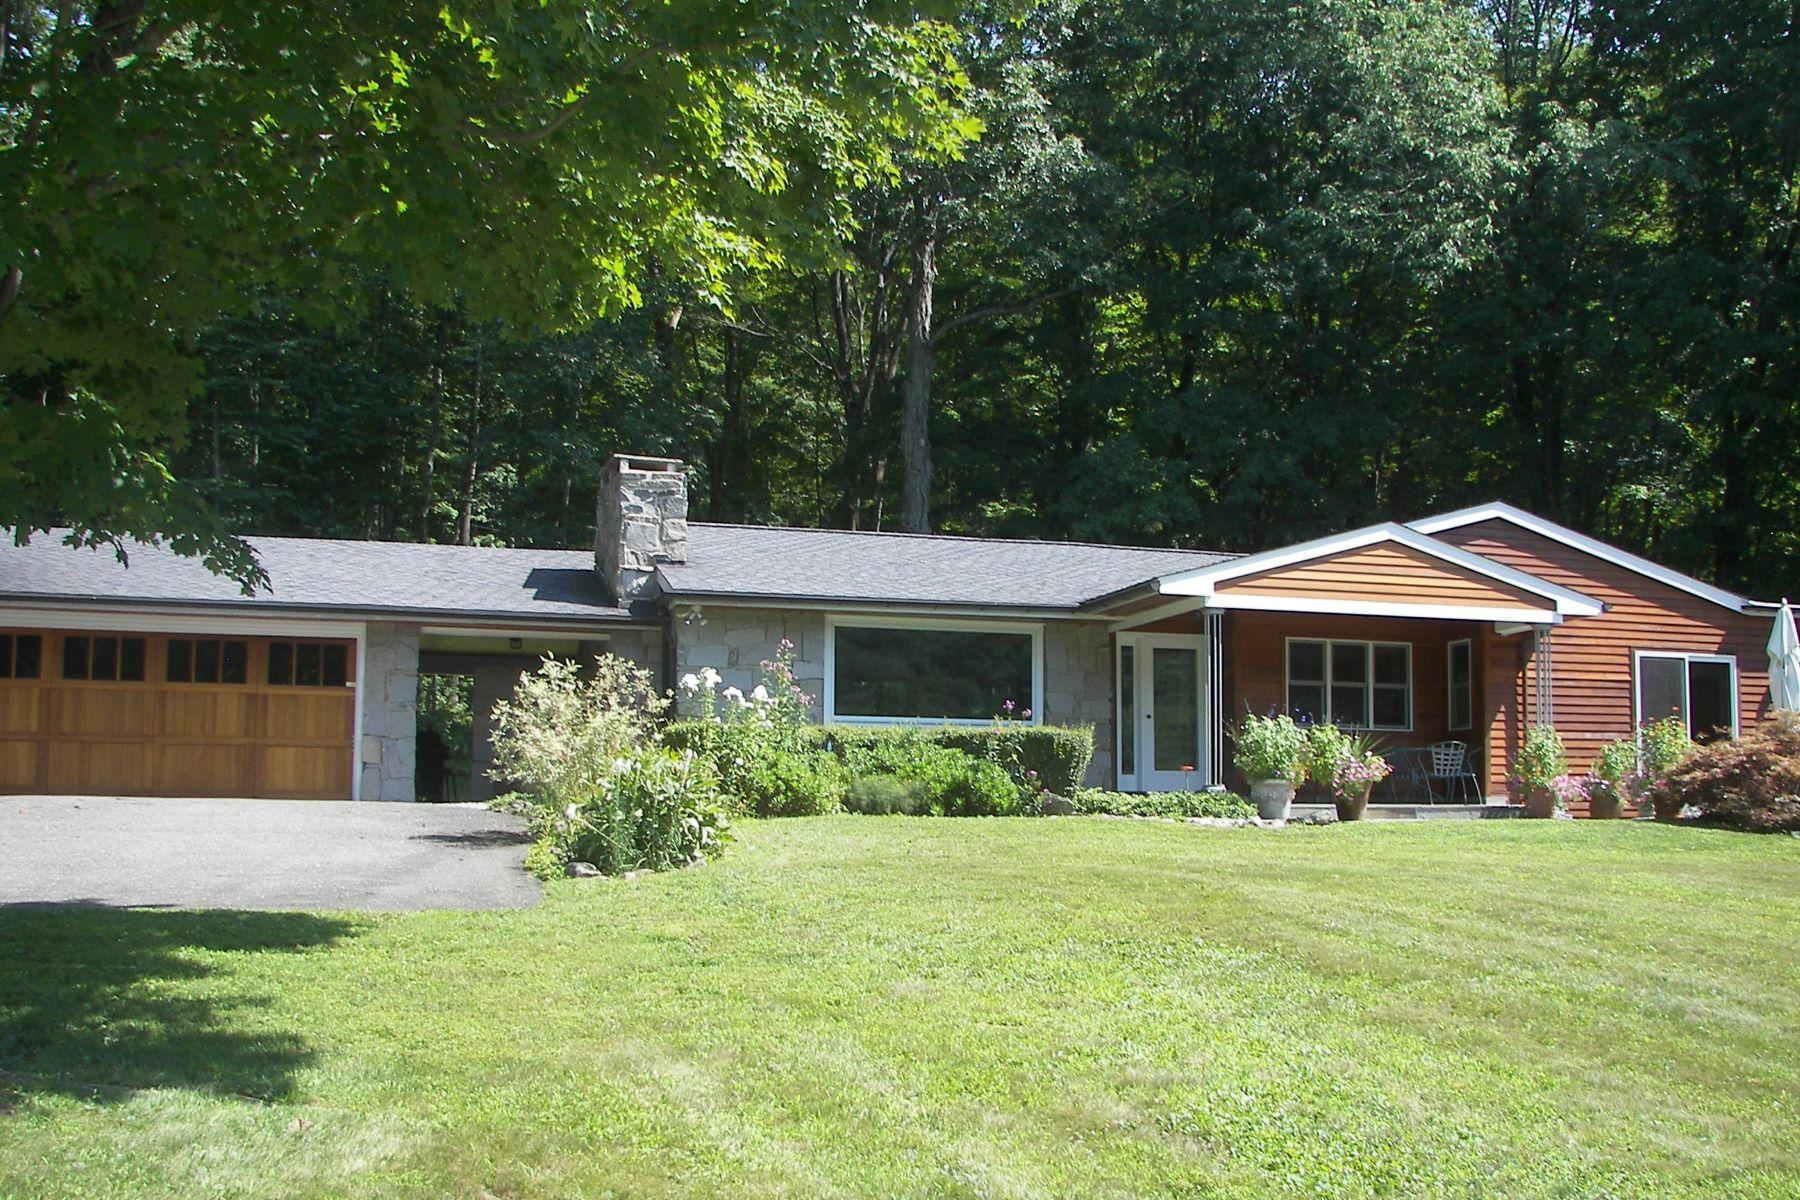 rentals property at Nettleton Hollow Rental